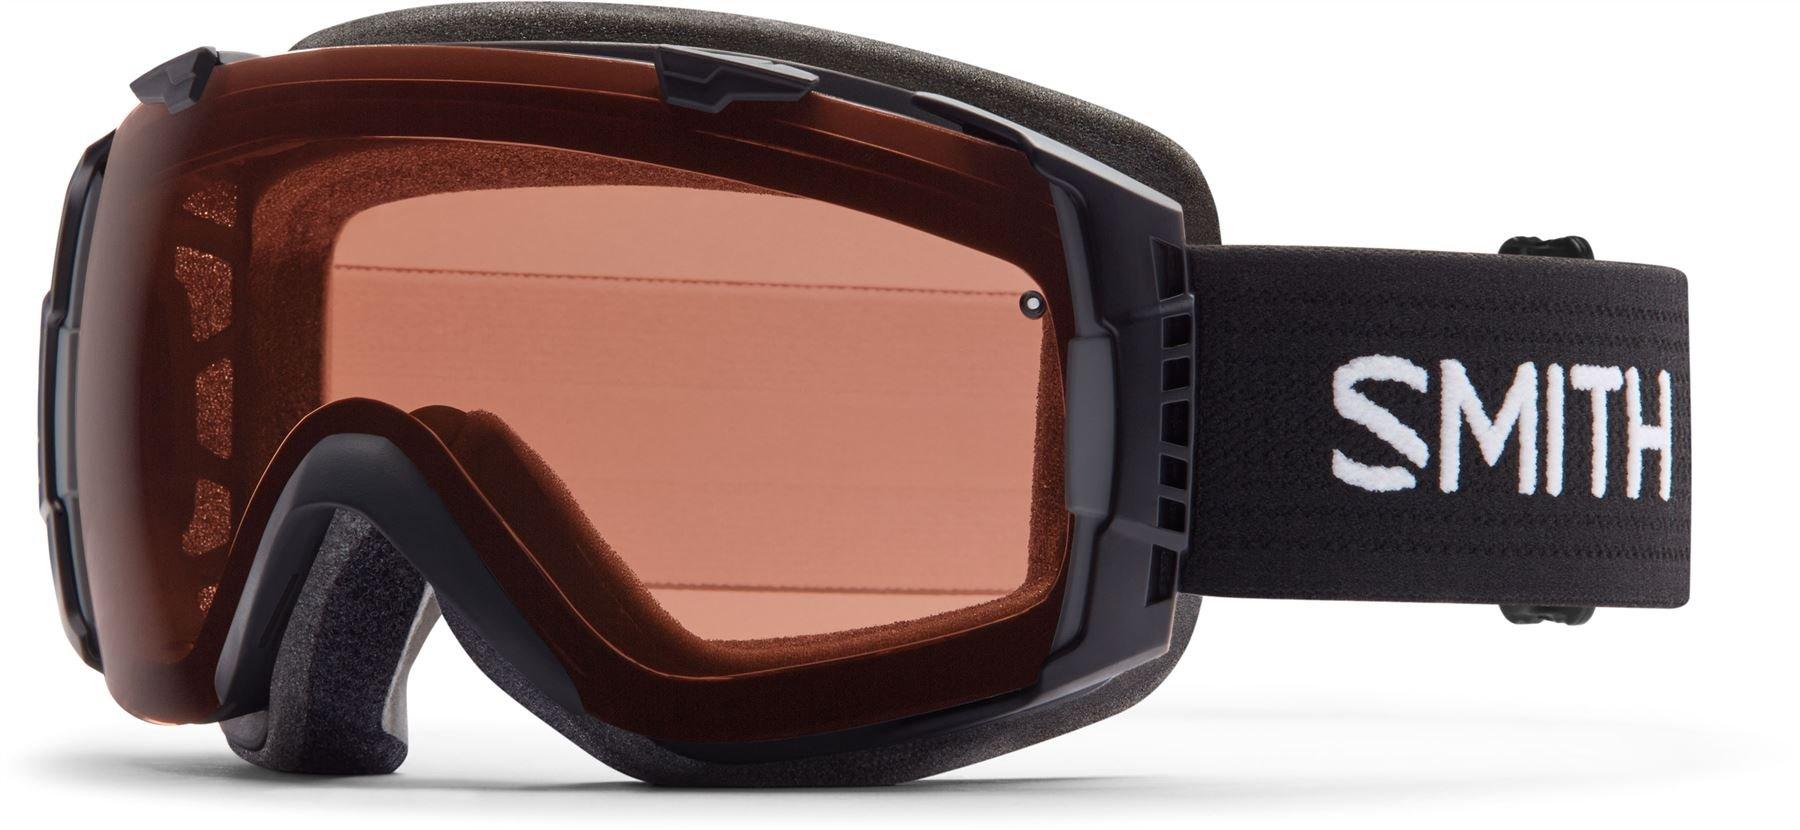 Smith Optics I/O Adult Interchangable Series Snocross Snowmobile Goggles Eyewear - Black / Polarized Rose Copper / Medium by Smith Optics